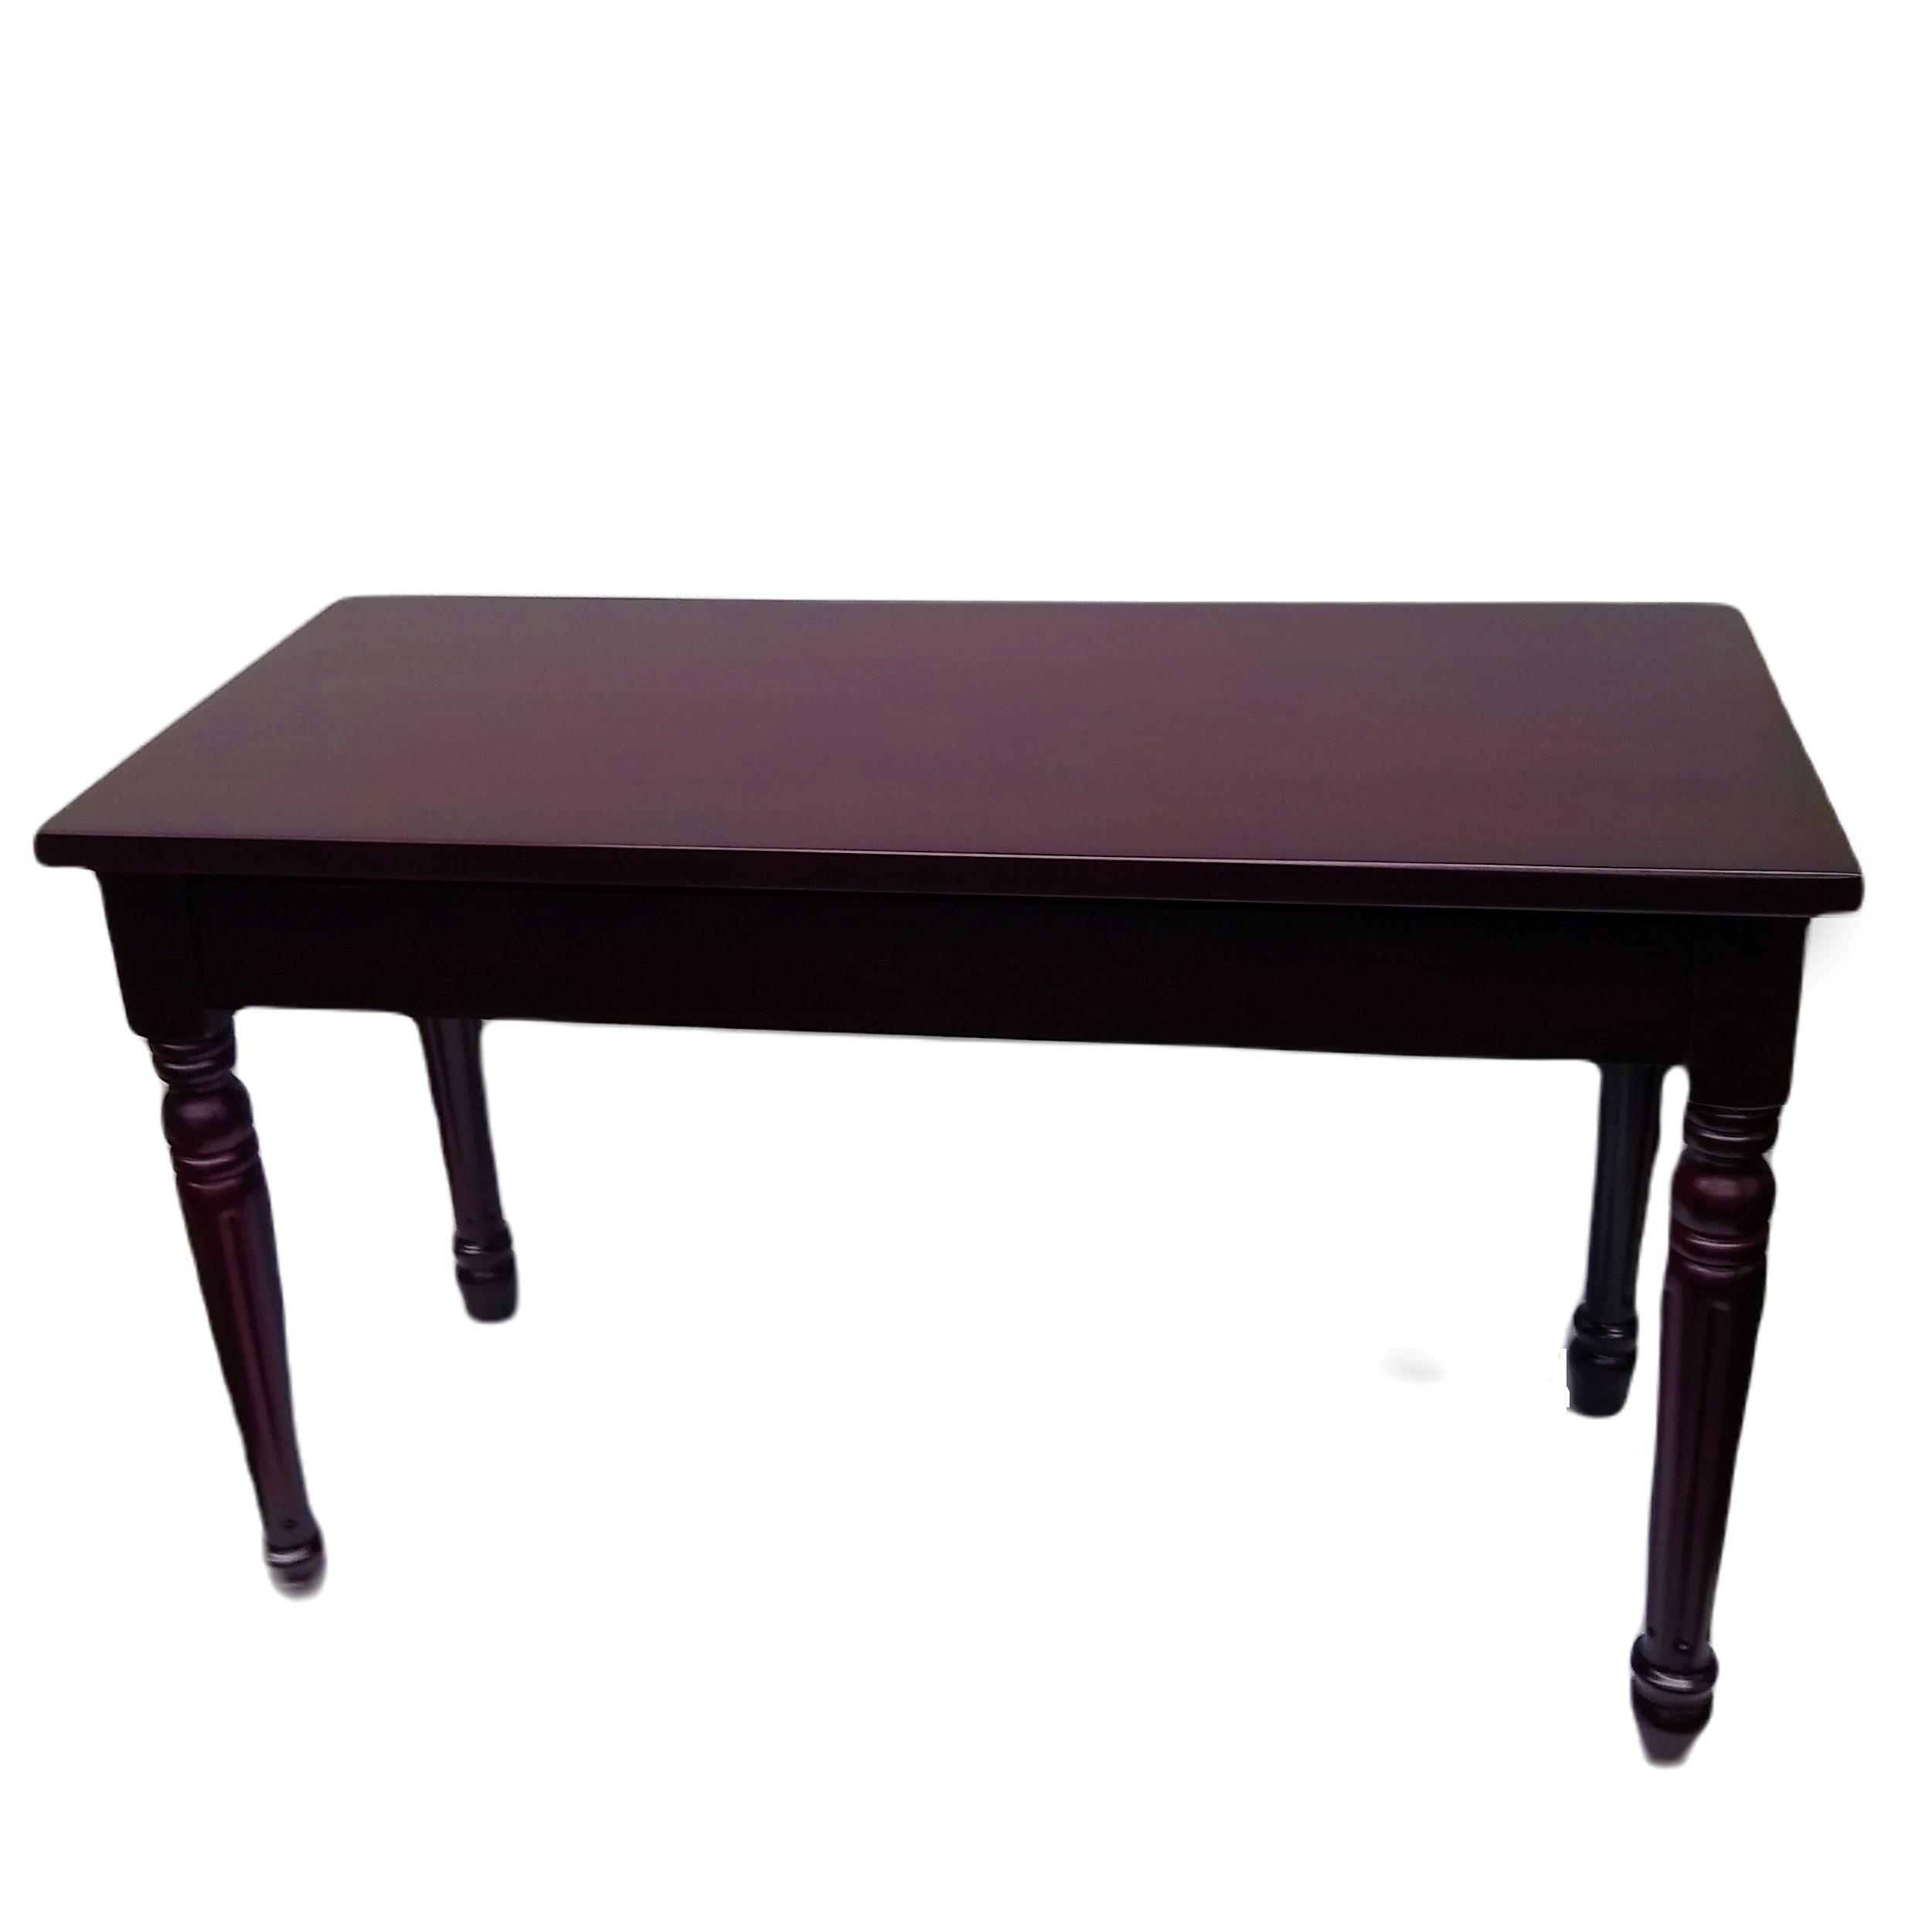 Frederick Duet Louis Piano Bench Mahogany Satin Hard Top